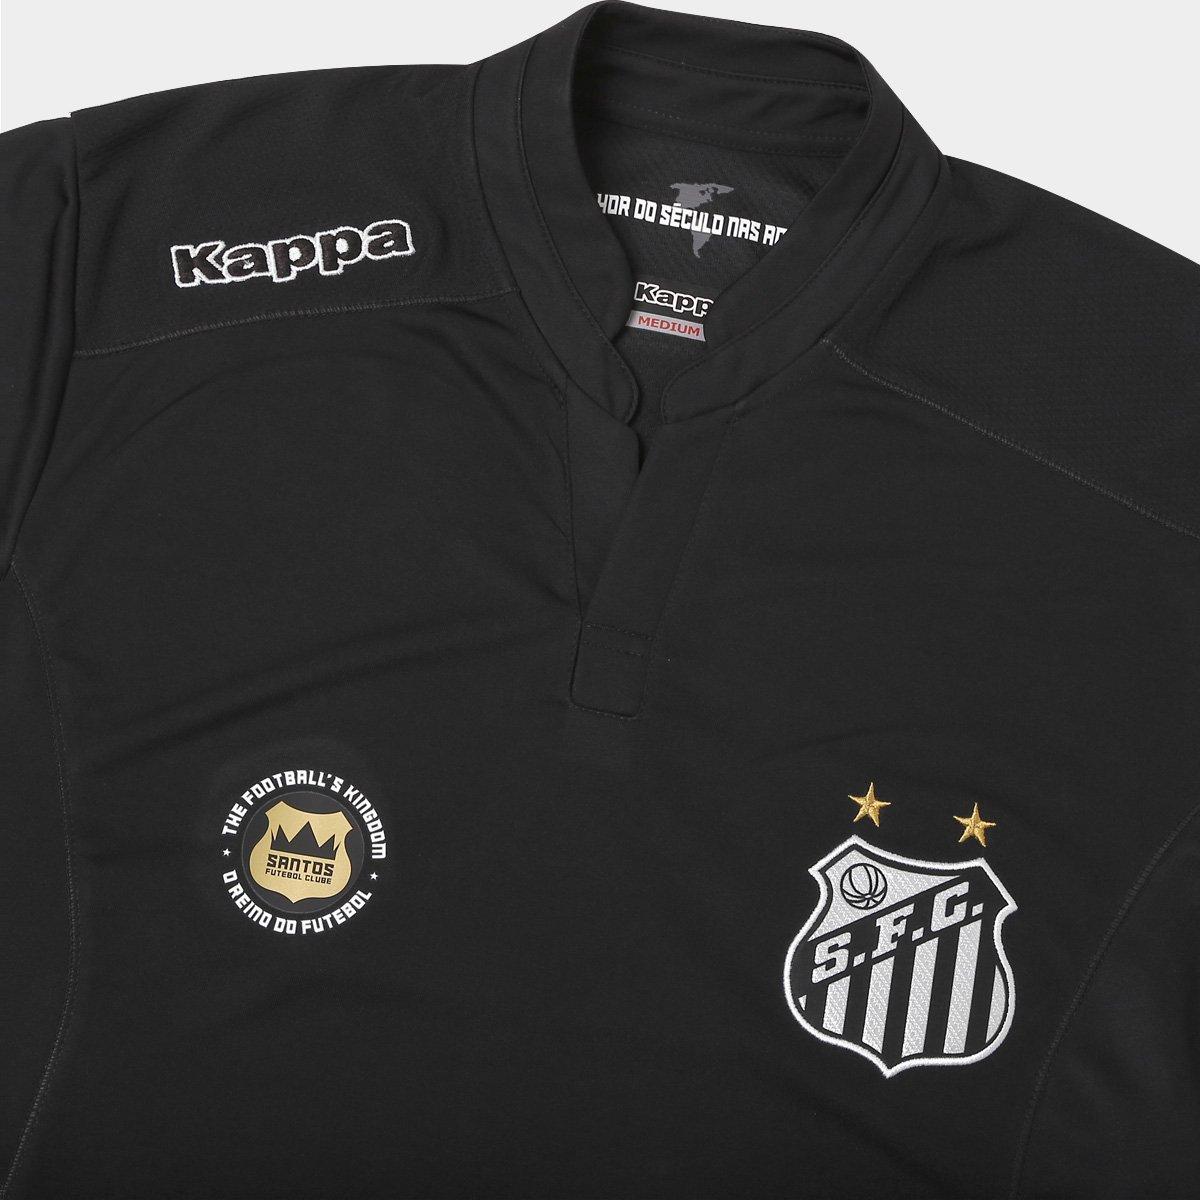 0e3c3faead Camisa Santos Goleiro I 2016 s nº Torcedor Kappa Masculina - Compre ...